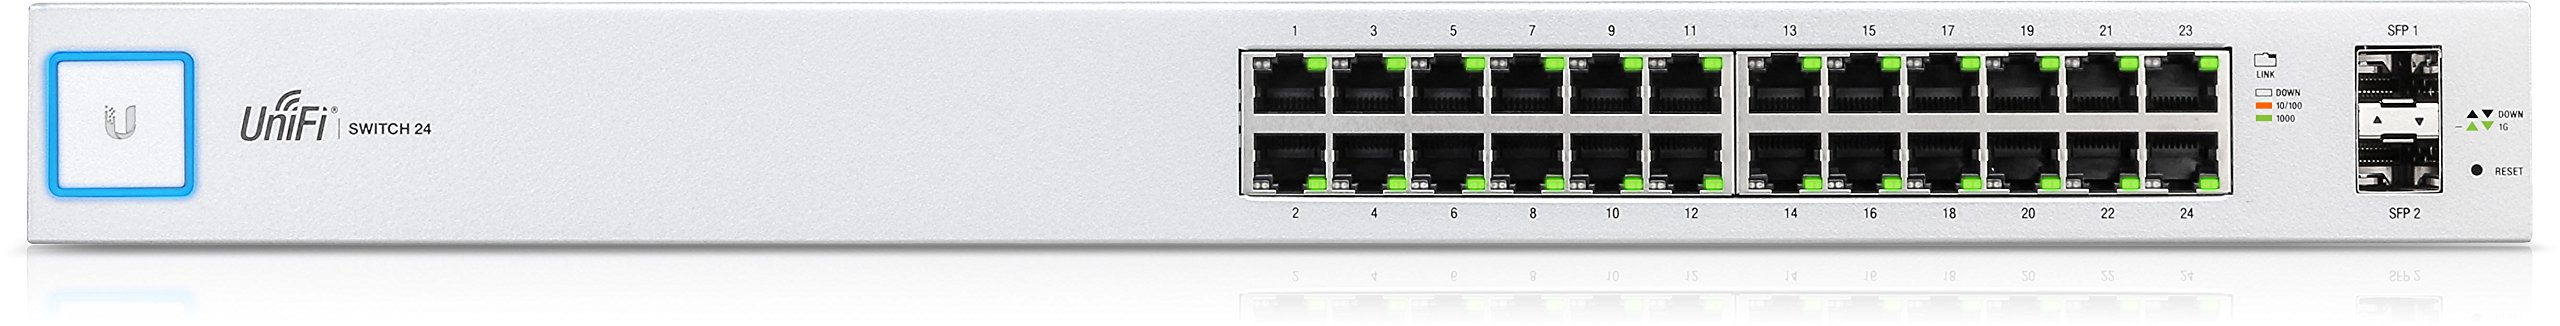 Ubiquiti US-24 Unifi Switch by Ubiquiti Networks